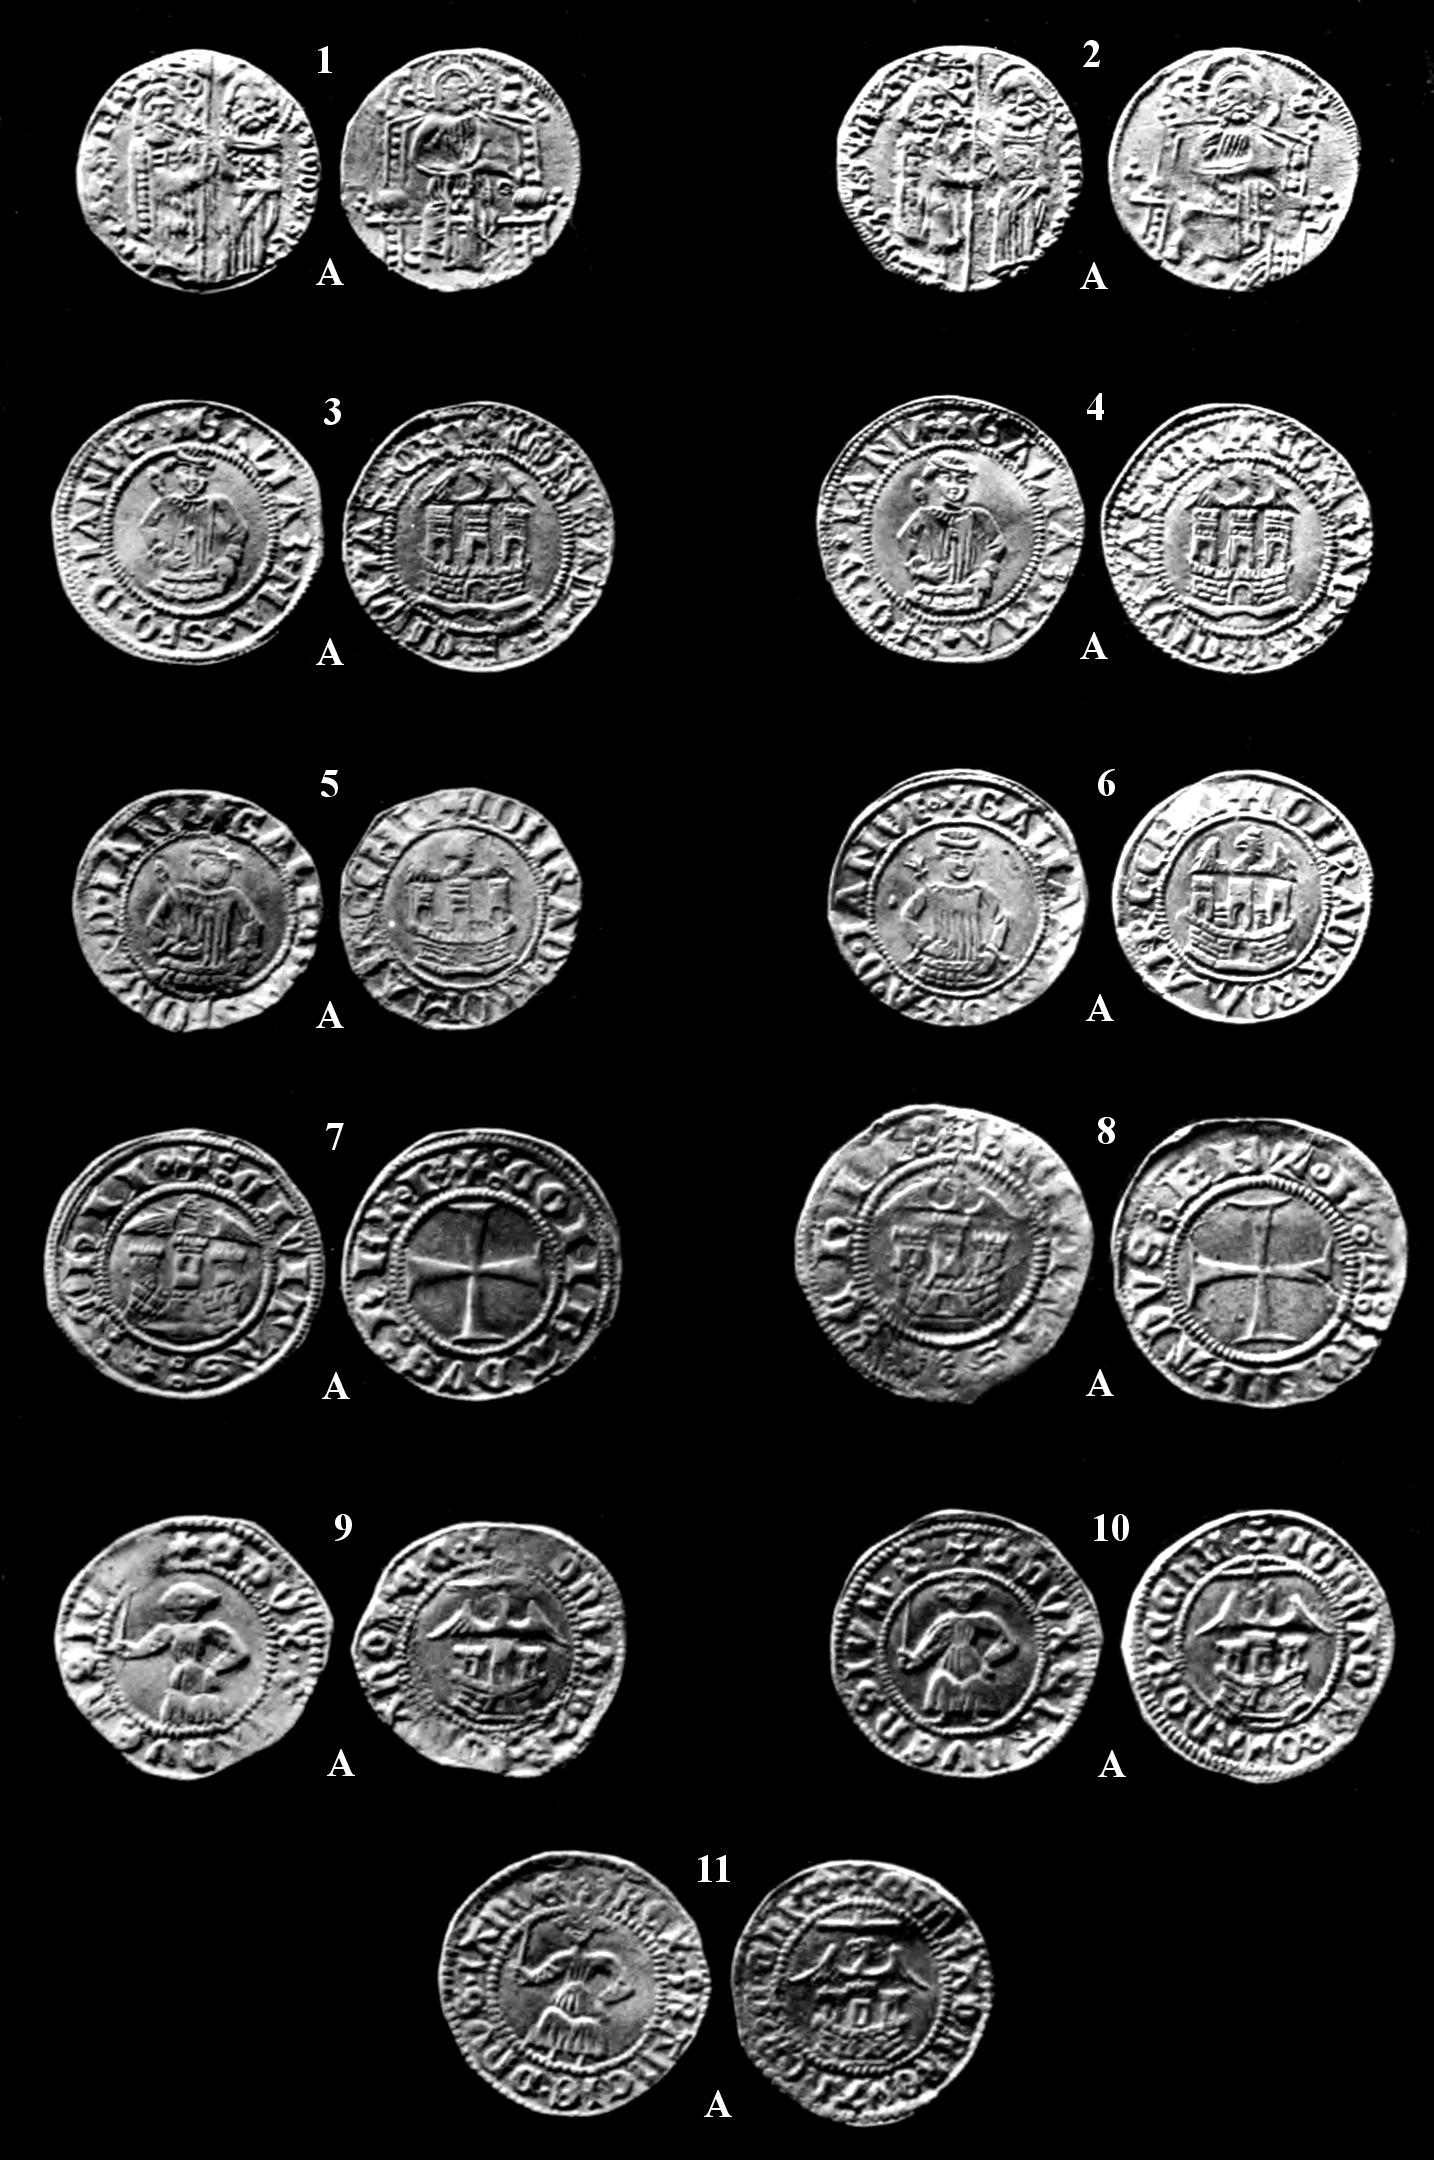 ebd4845290 Numismatica - Wikipedia